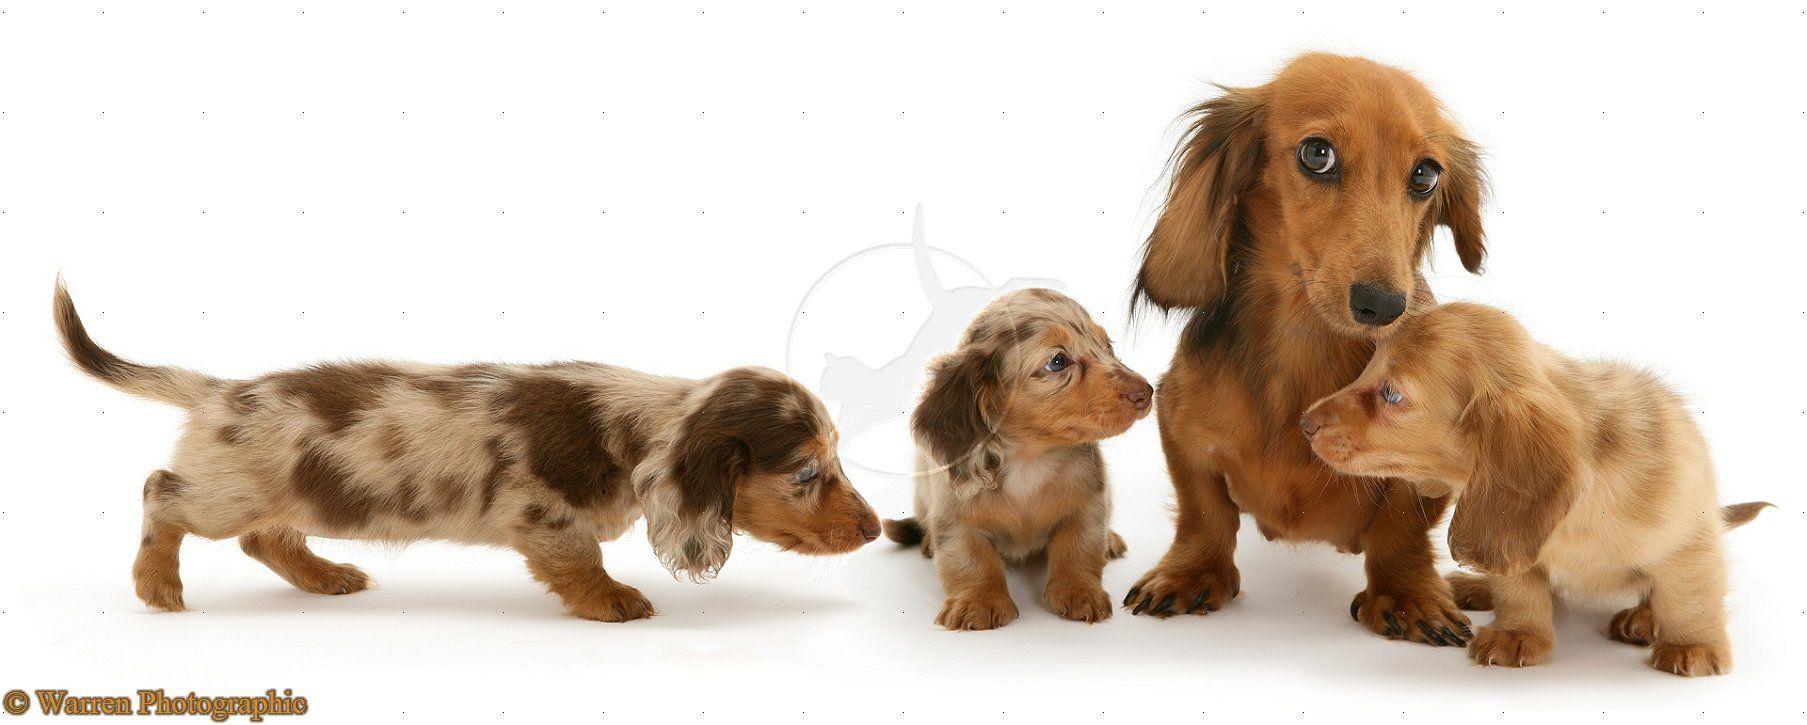 Dachshund family | dachshunds | Pinterest | Dachshunds, Animal and Dog